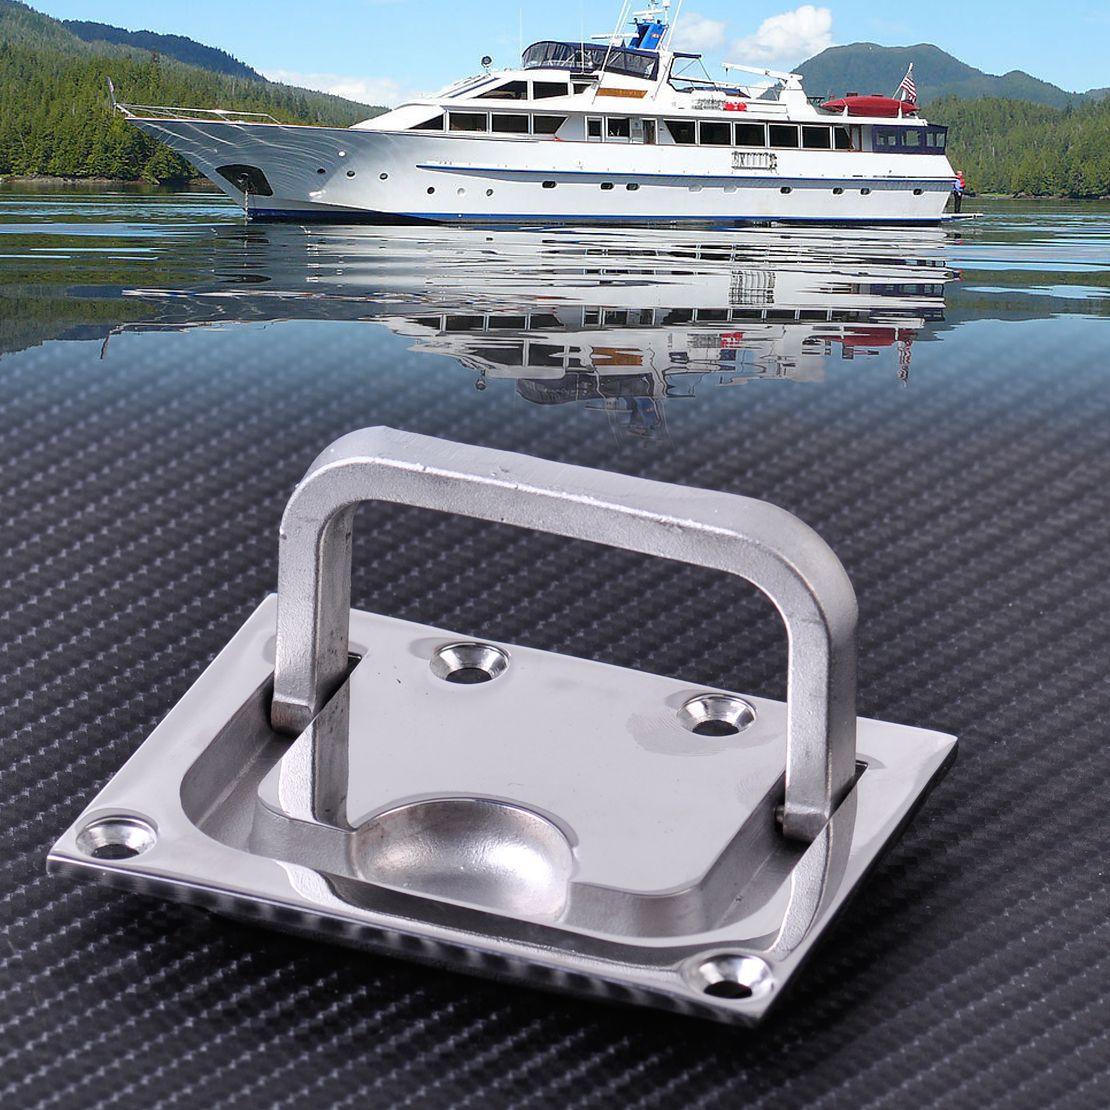 Citall alta calidad 316 acero inoxidable para barco caravana Marina flush Hatch locker ascensor gabinete tirador Equipos